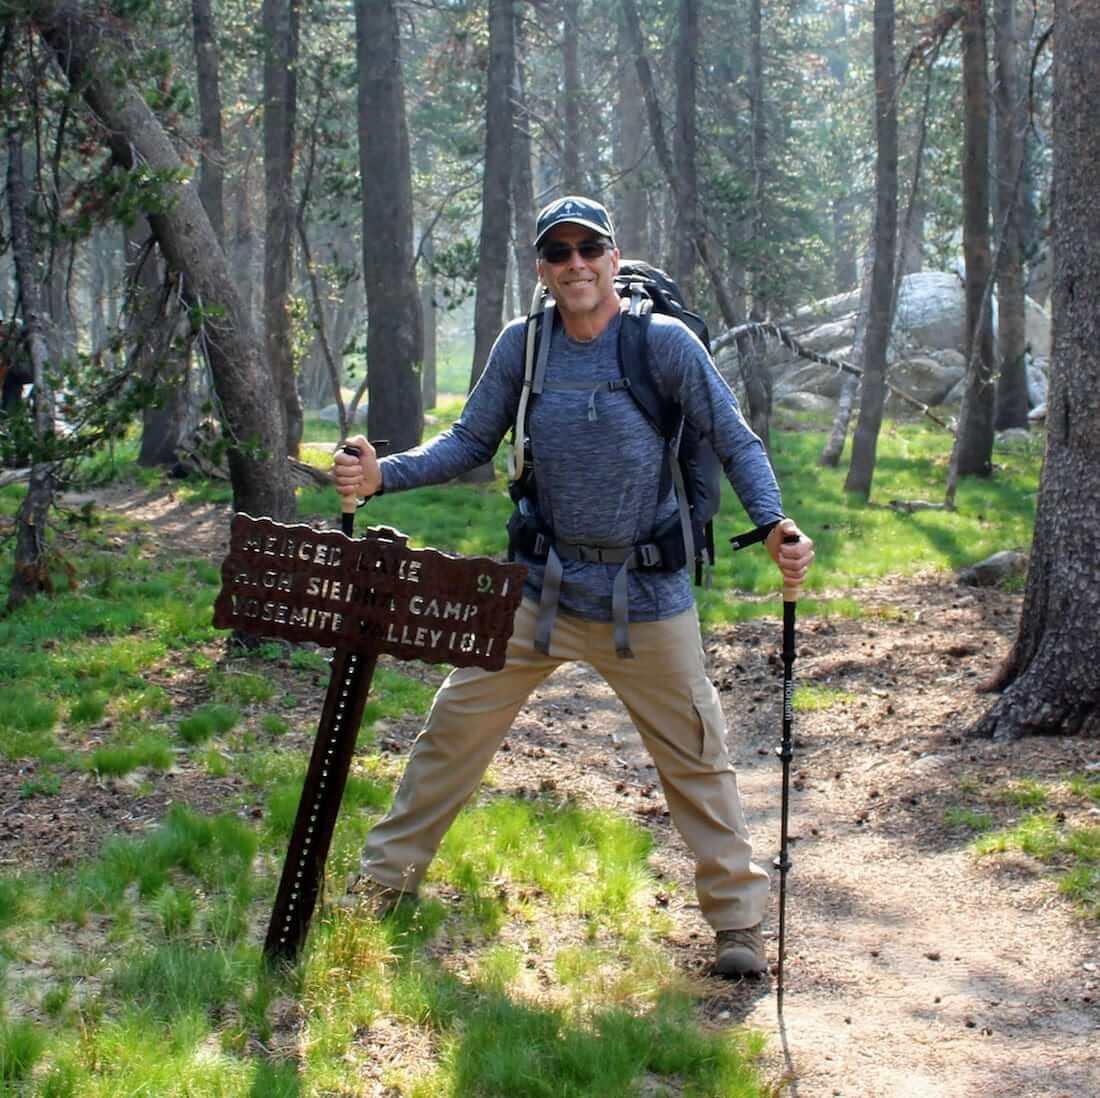 Hiking back poles